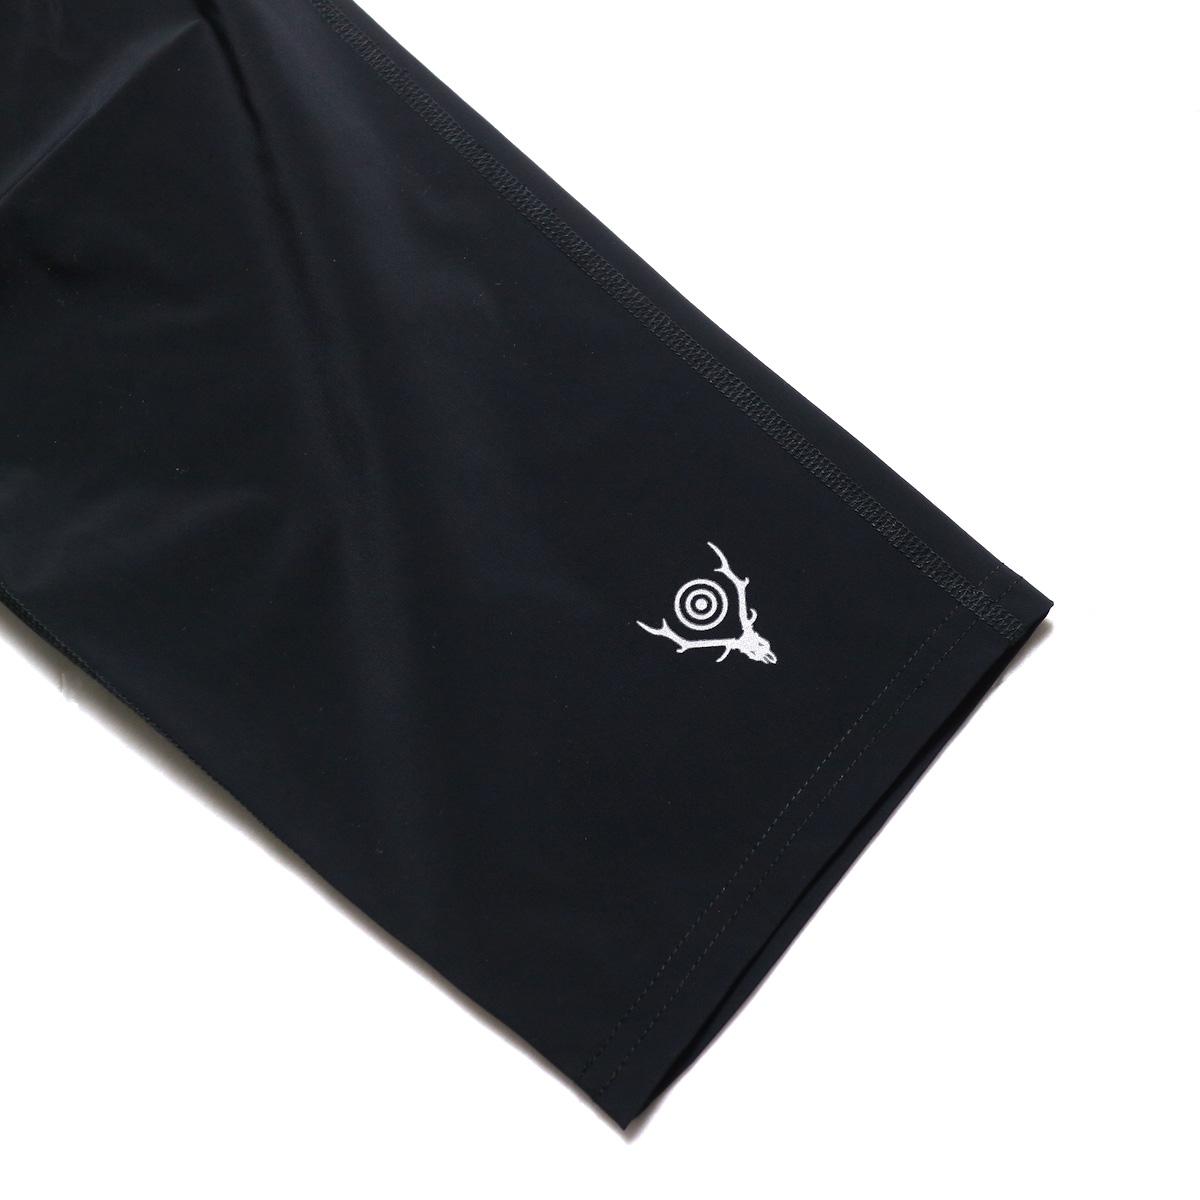 SOUTH2 WEST8 / 1P Cycle Pant-N/Pu Taffeta (Black) 裾